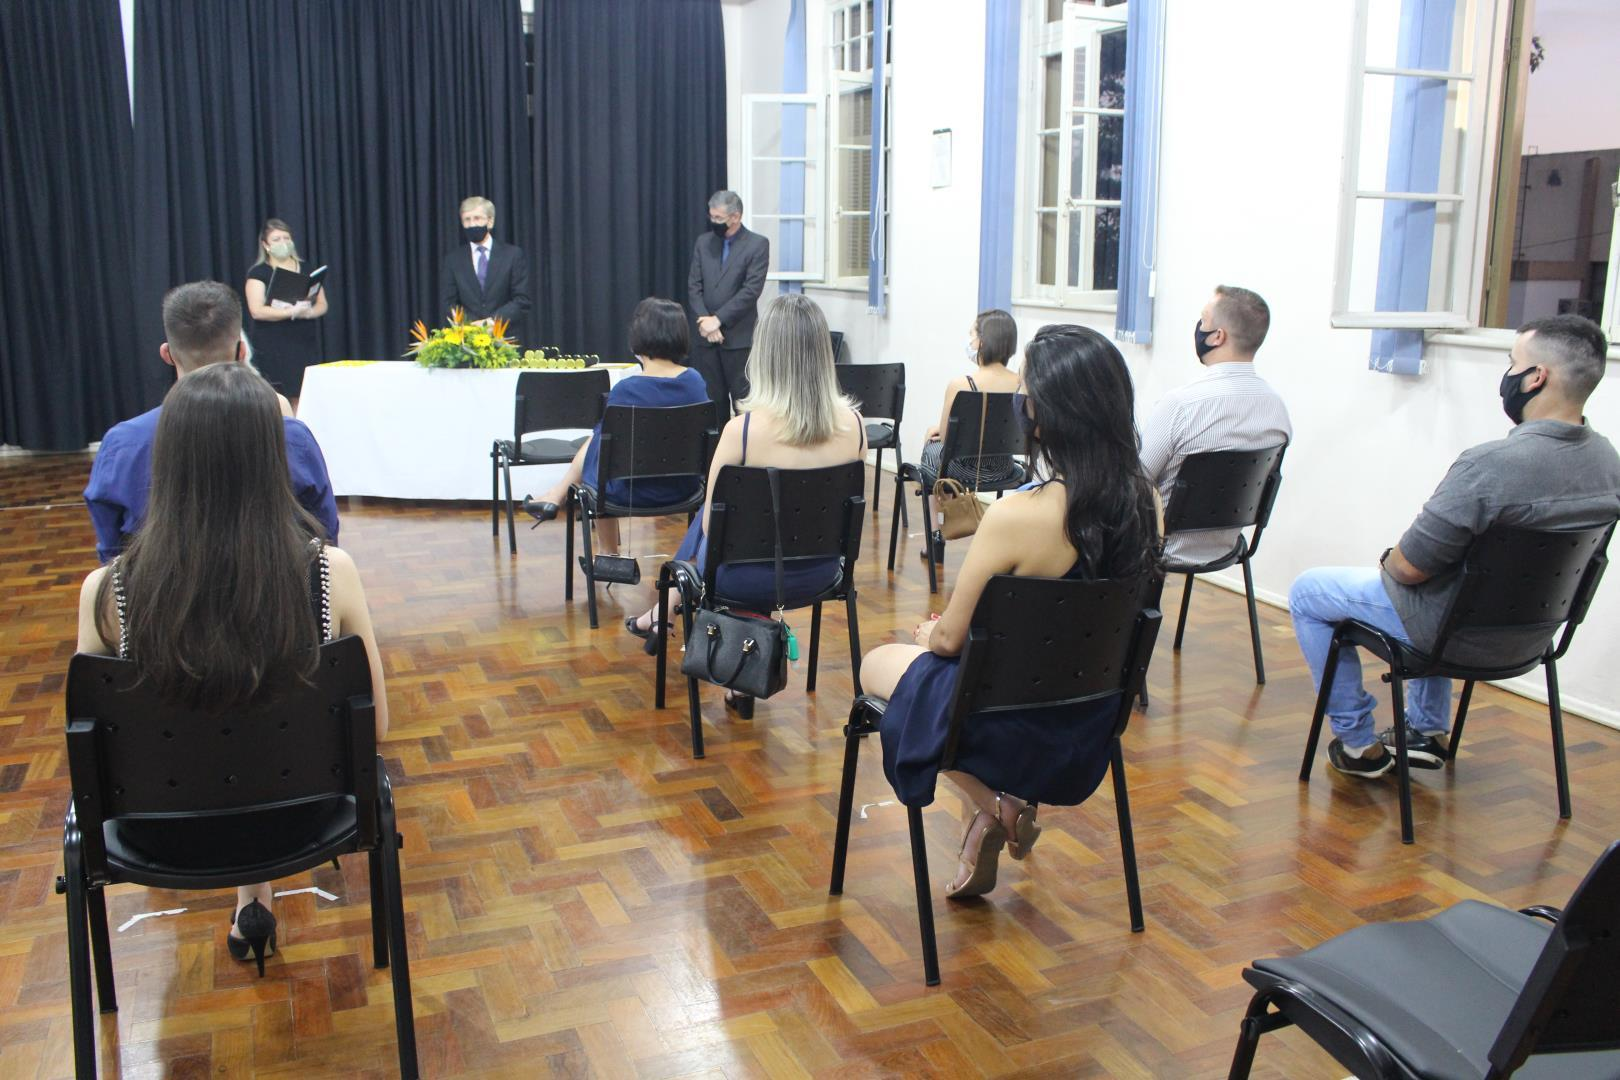 Formatura de gabinete ocorre na Faculdade IENH